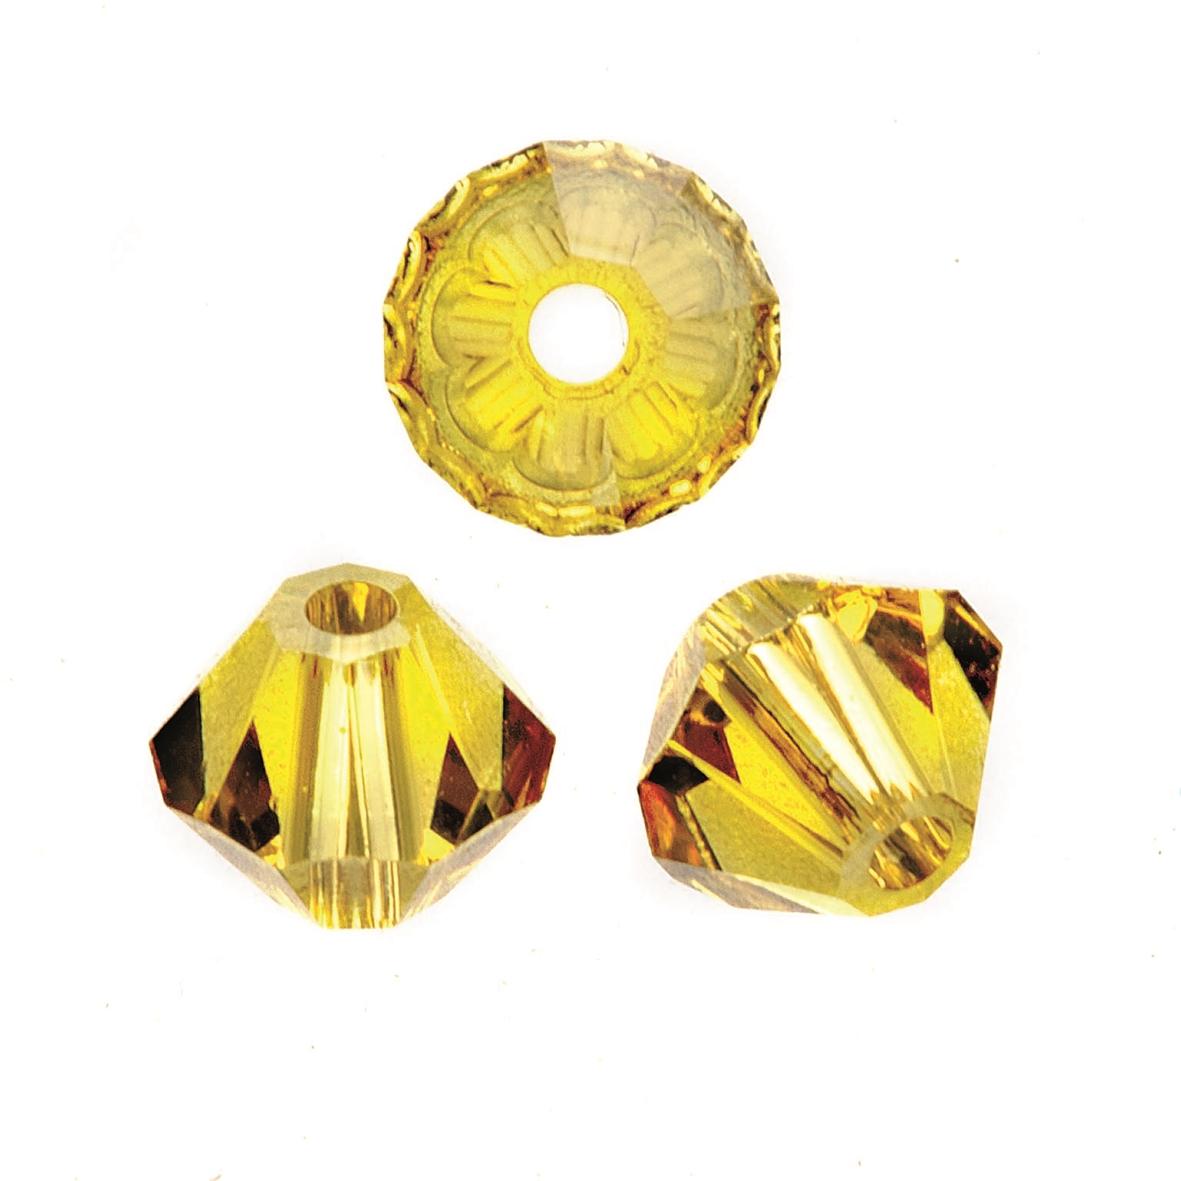 Perles Swarovski 4 mm jaune - Boîte de 25